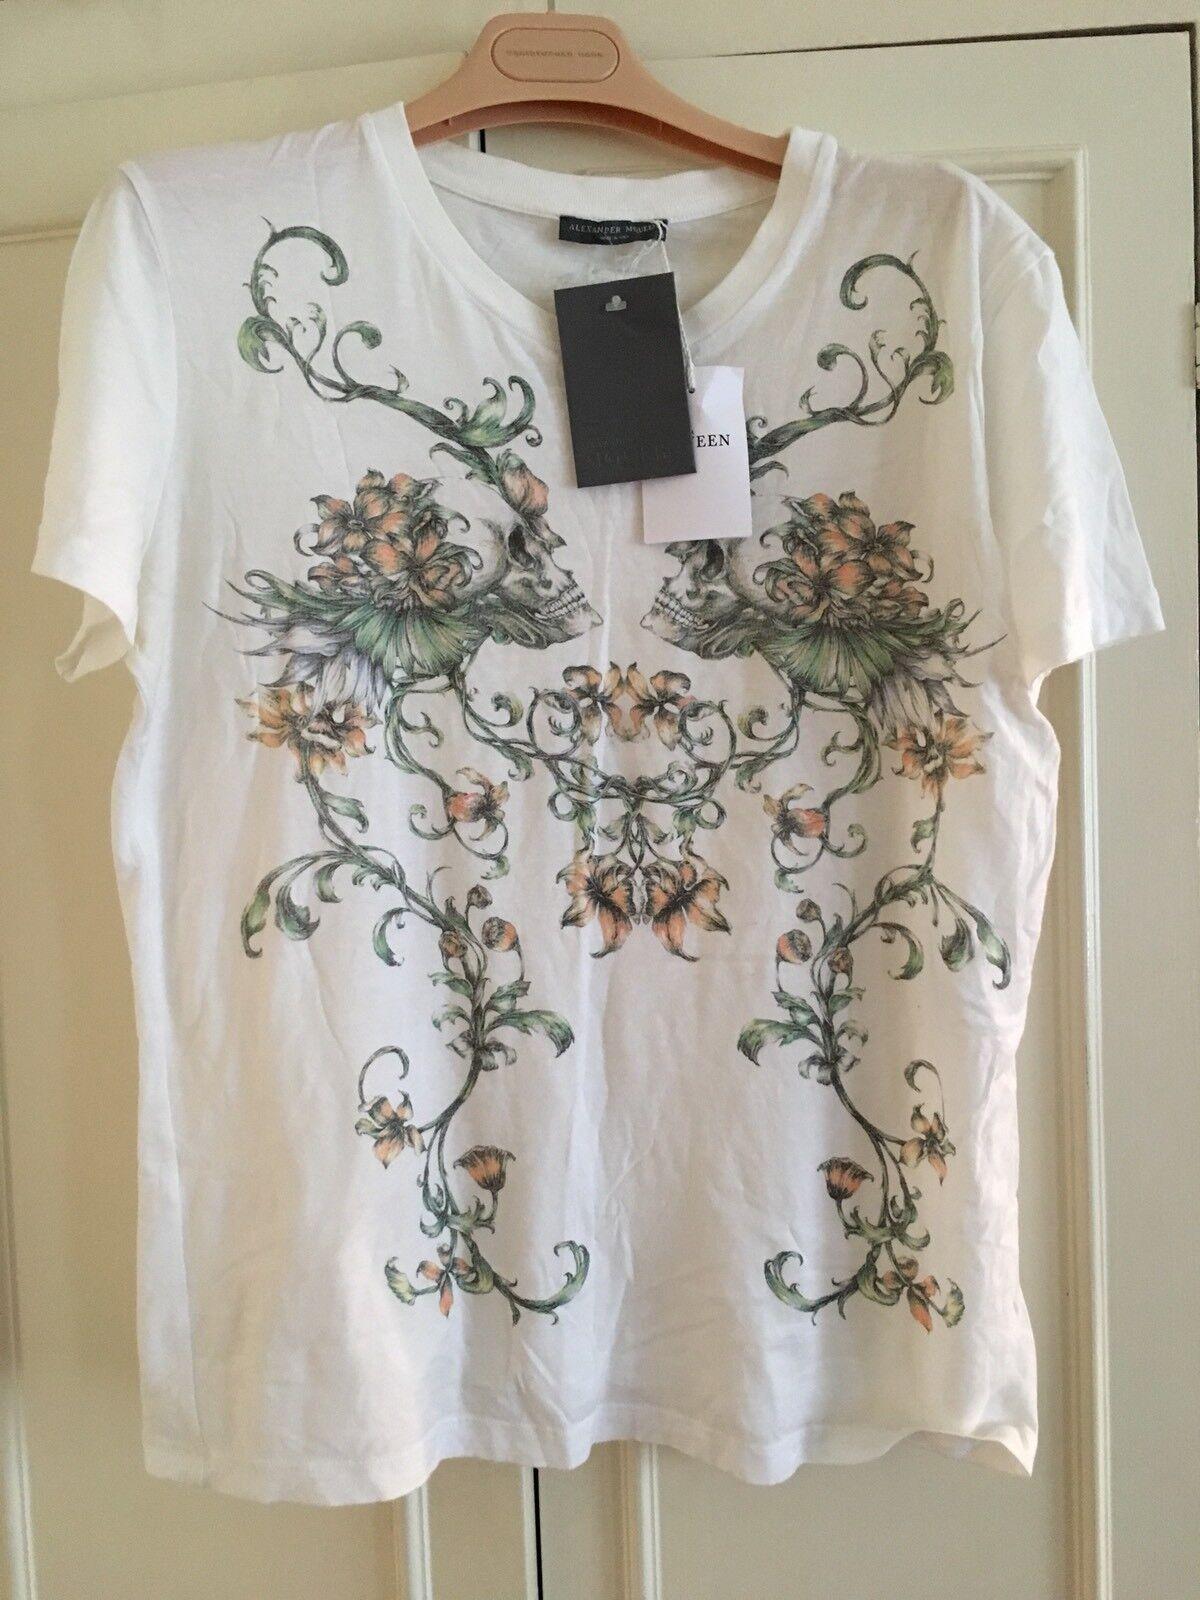 LAST HOURS  alexander mcqueen Womens White Tshirt Size 44 BNWT